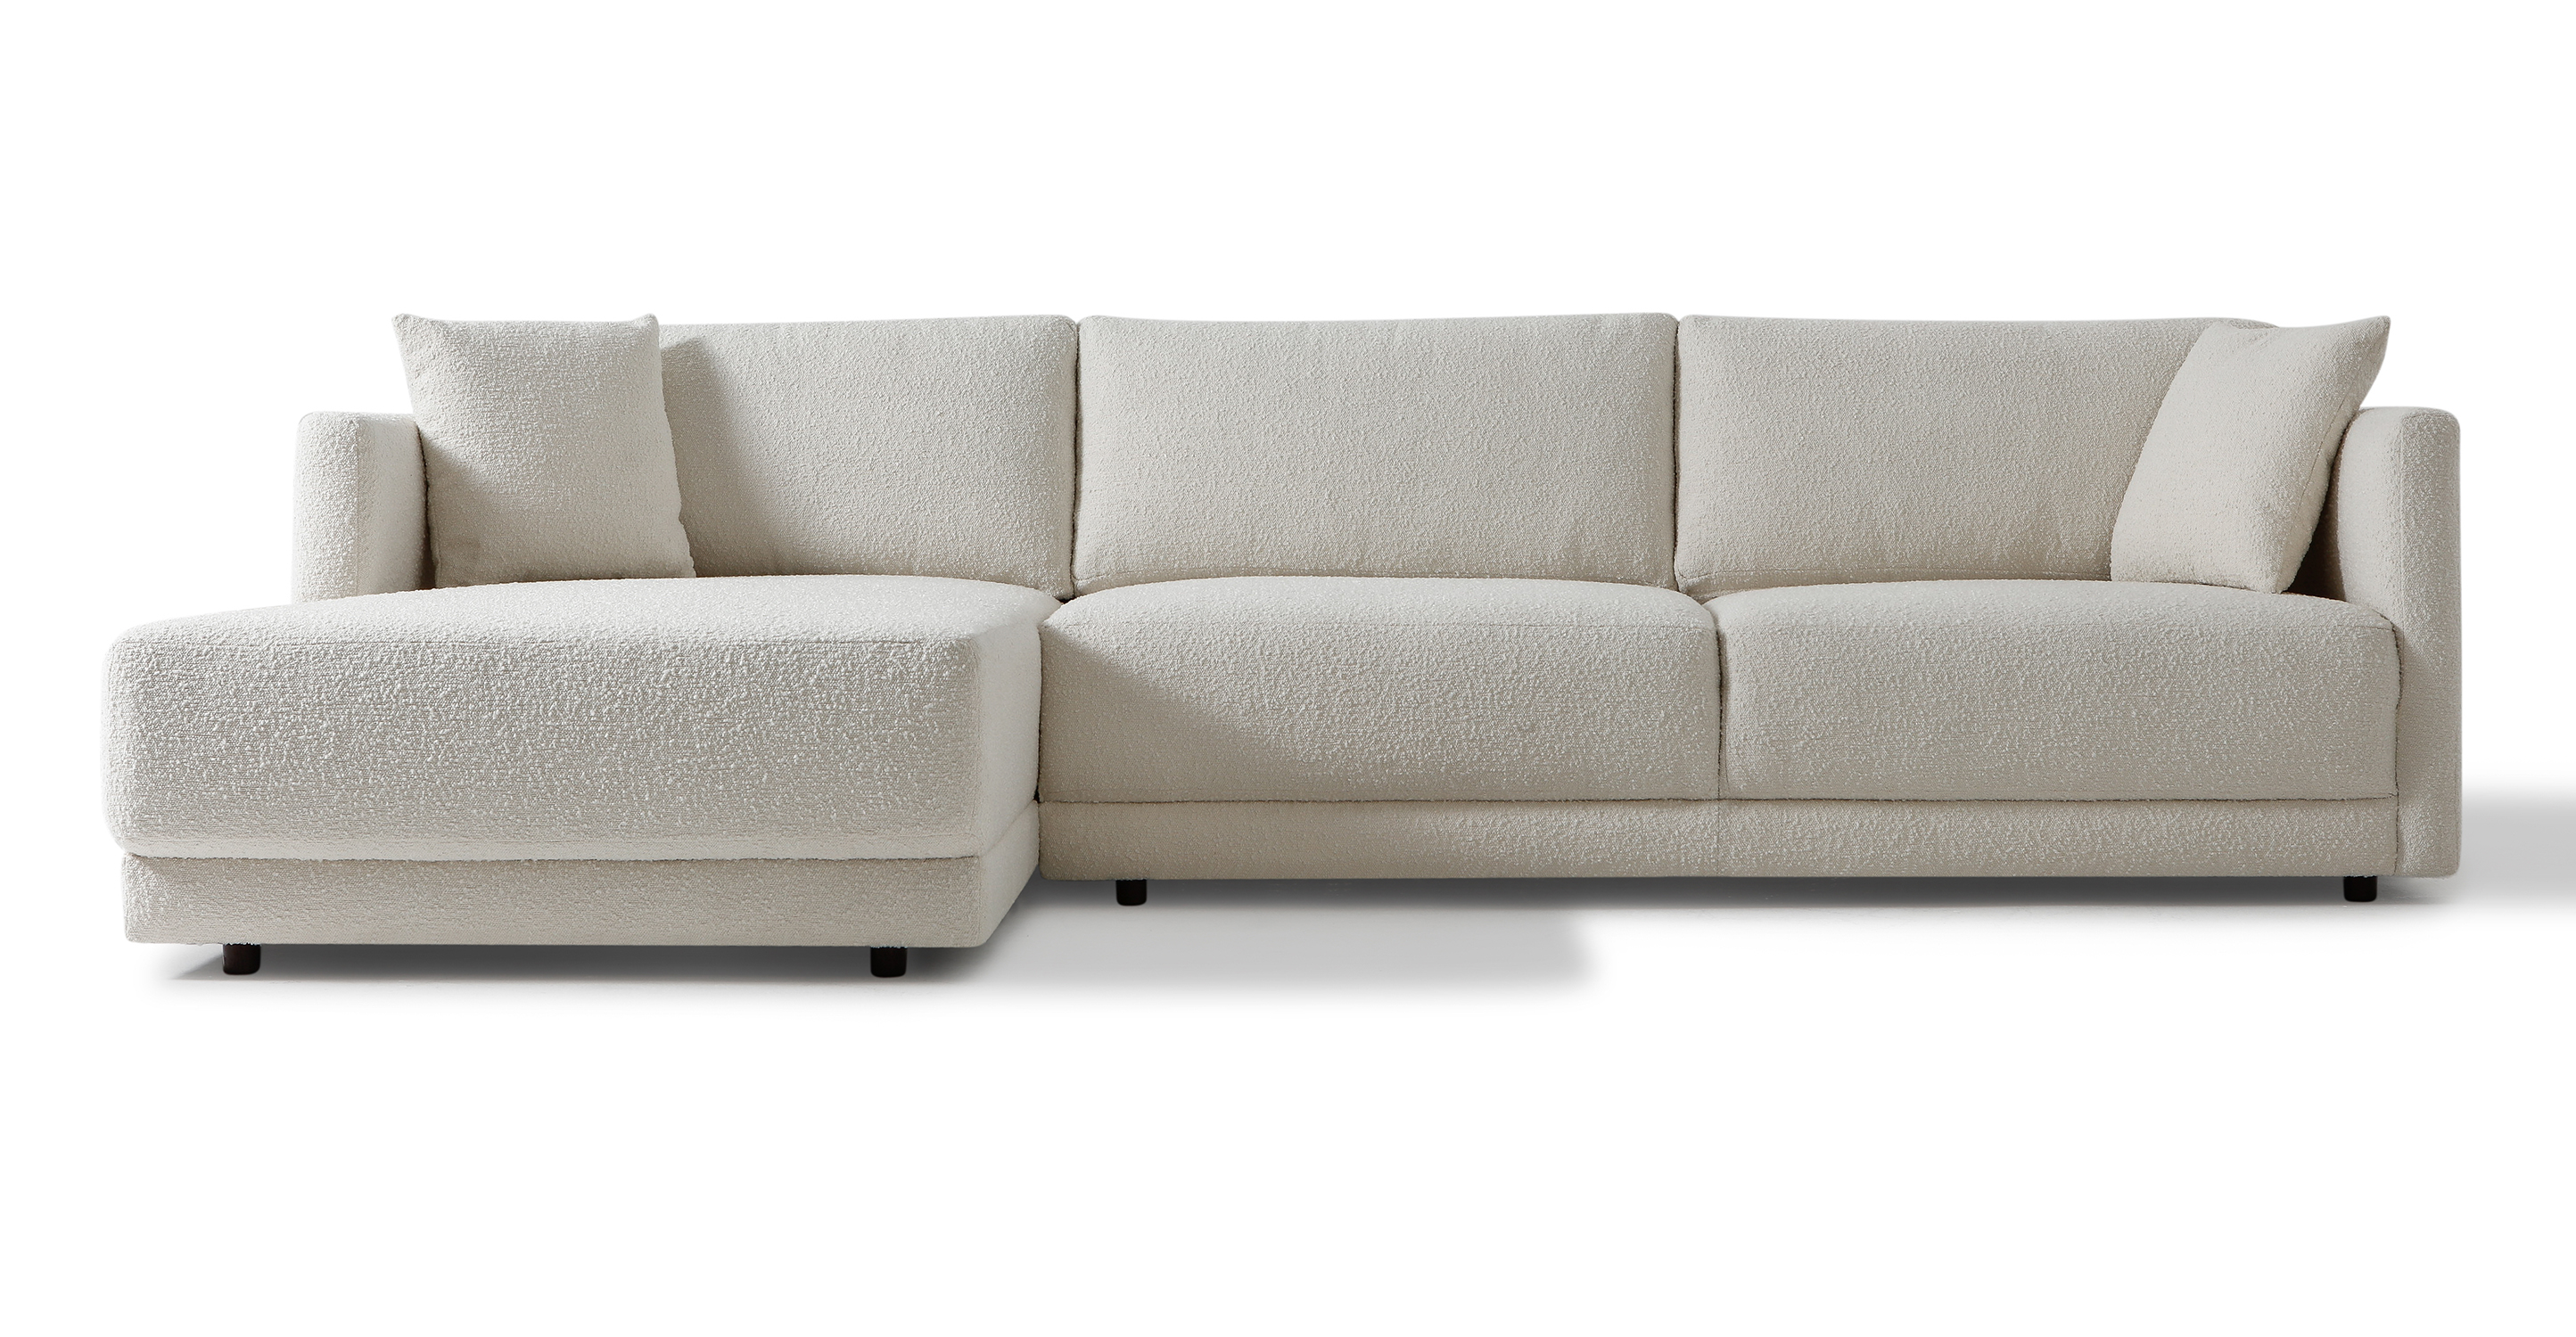 "Domus 115"" Fabric Sofa Sectional Left, Blanc Boucle"